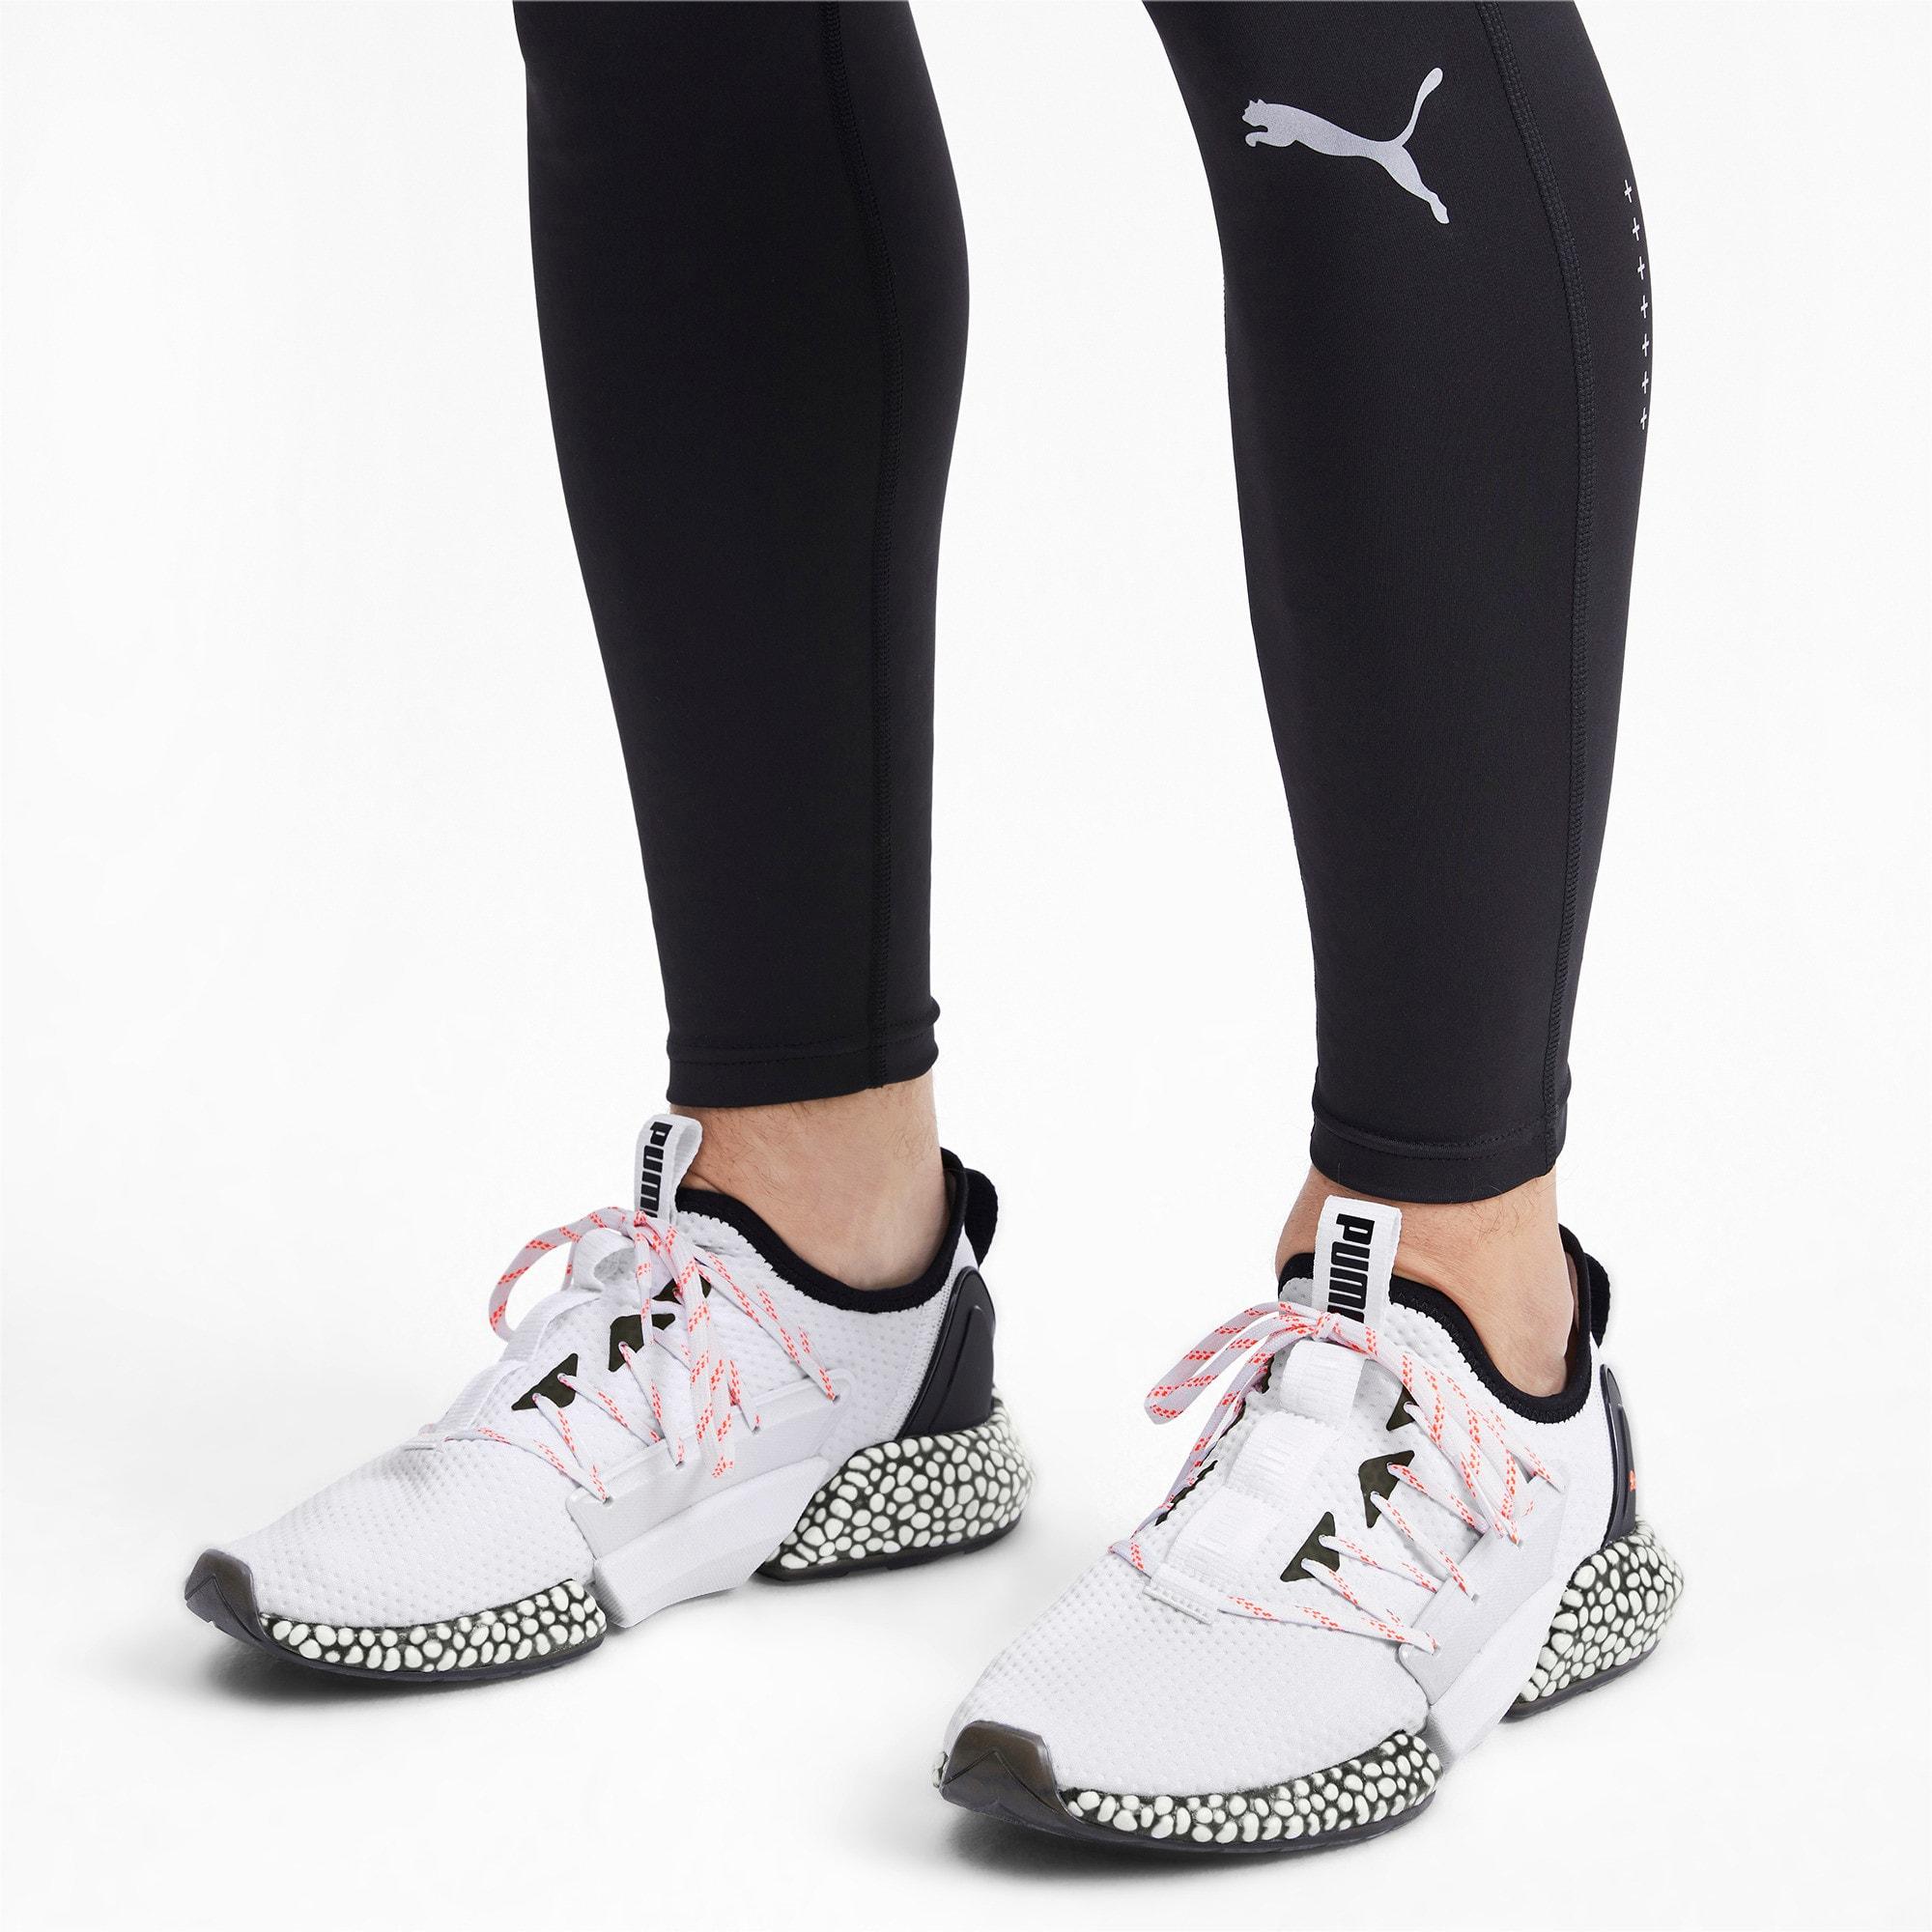 Thumbnail 2 of HYBRID Rocket Aero Men's Sneakers, Puma White-Puma Black, medium